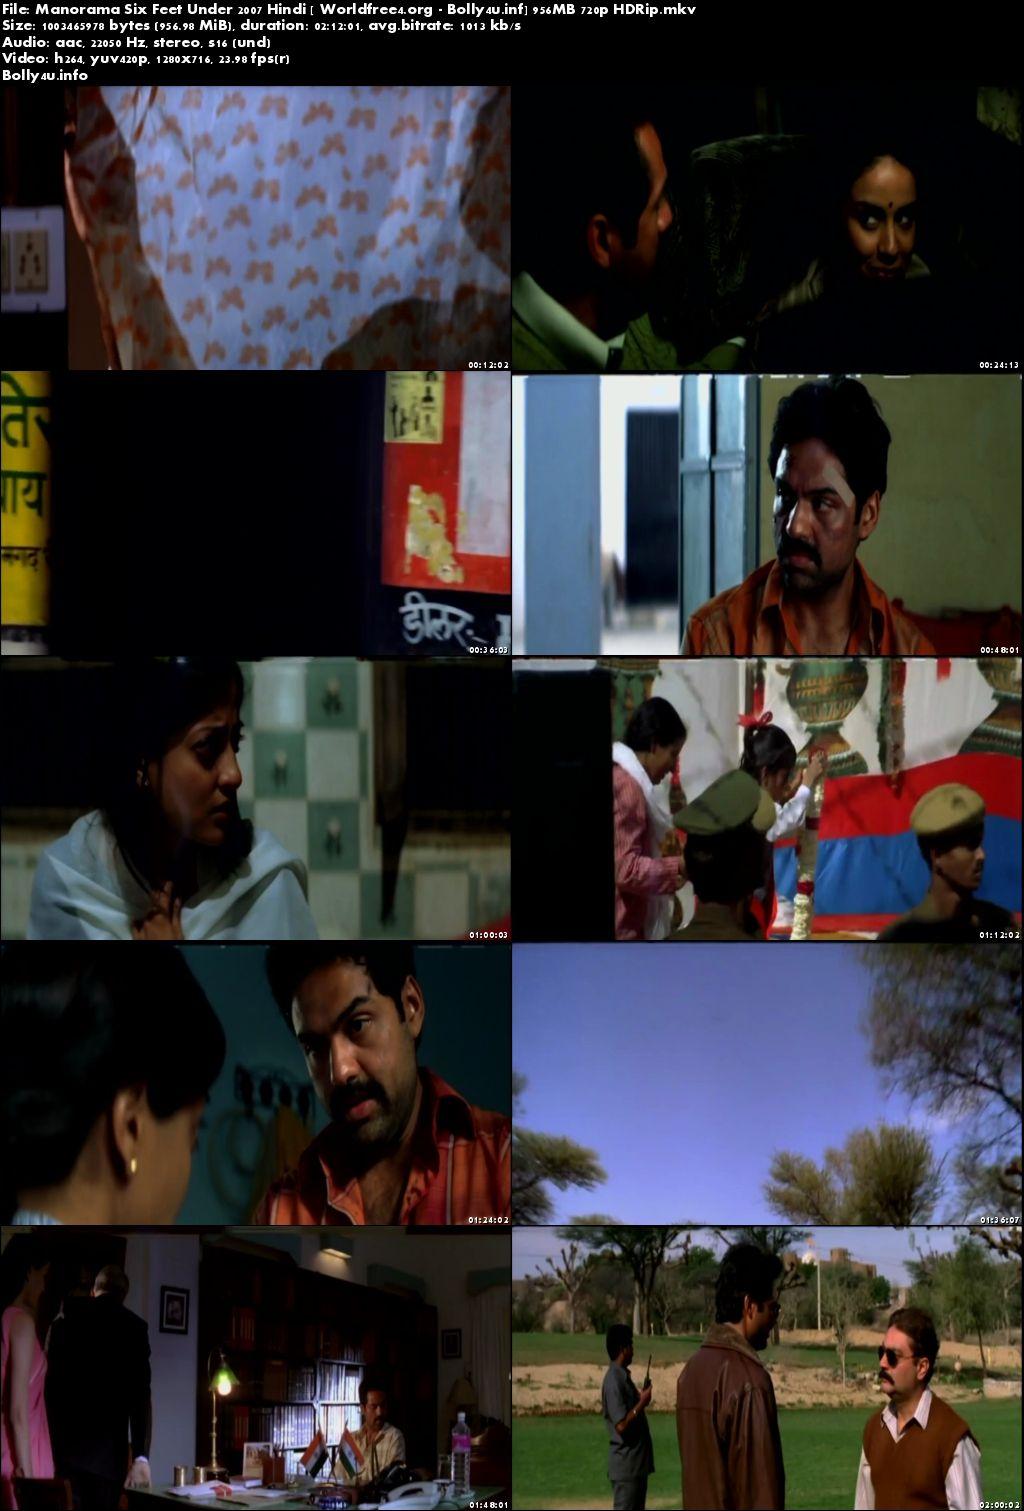 Manorama Six Feet Under 2007 HDRip 350MB Hindi Movie 480p Download